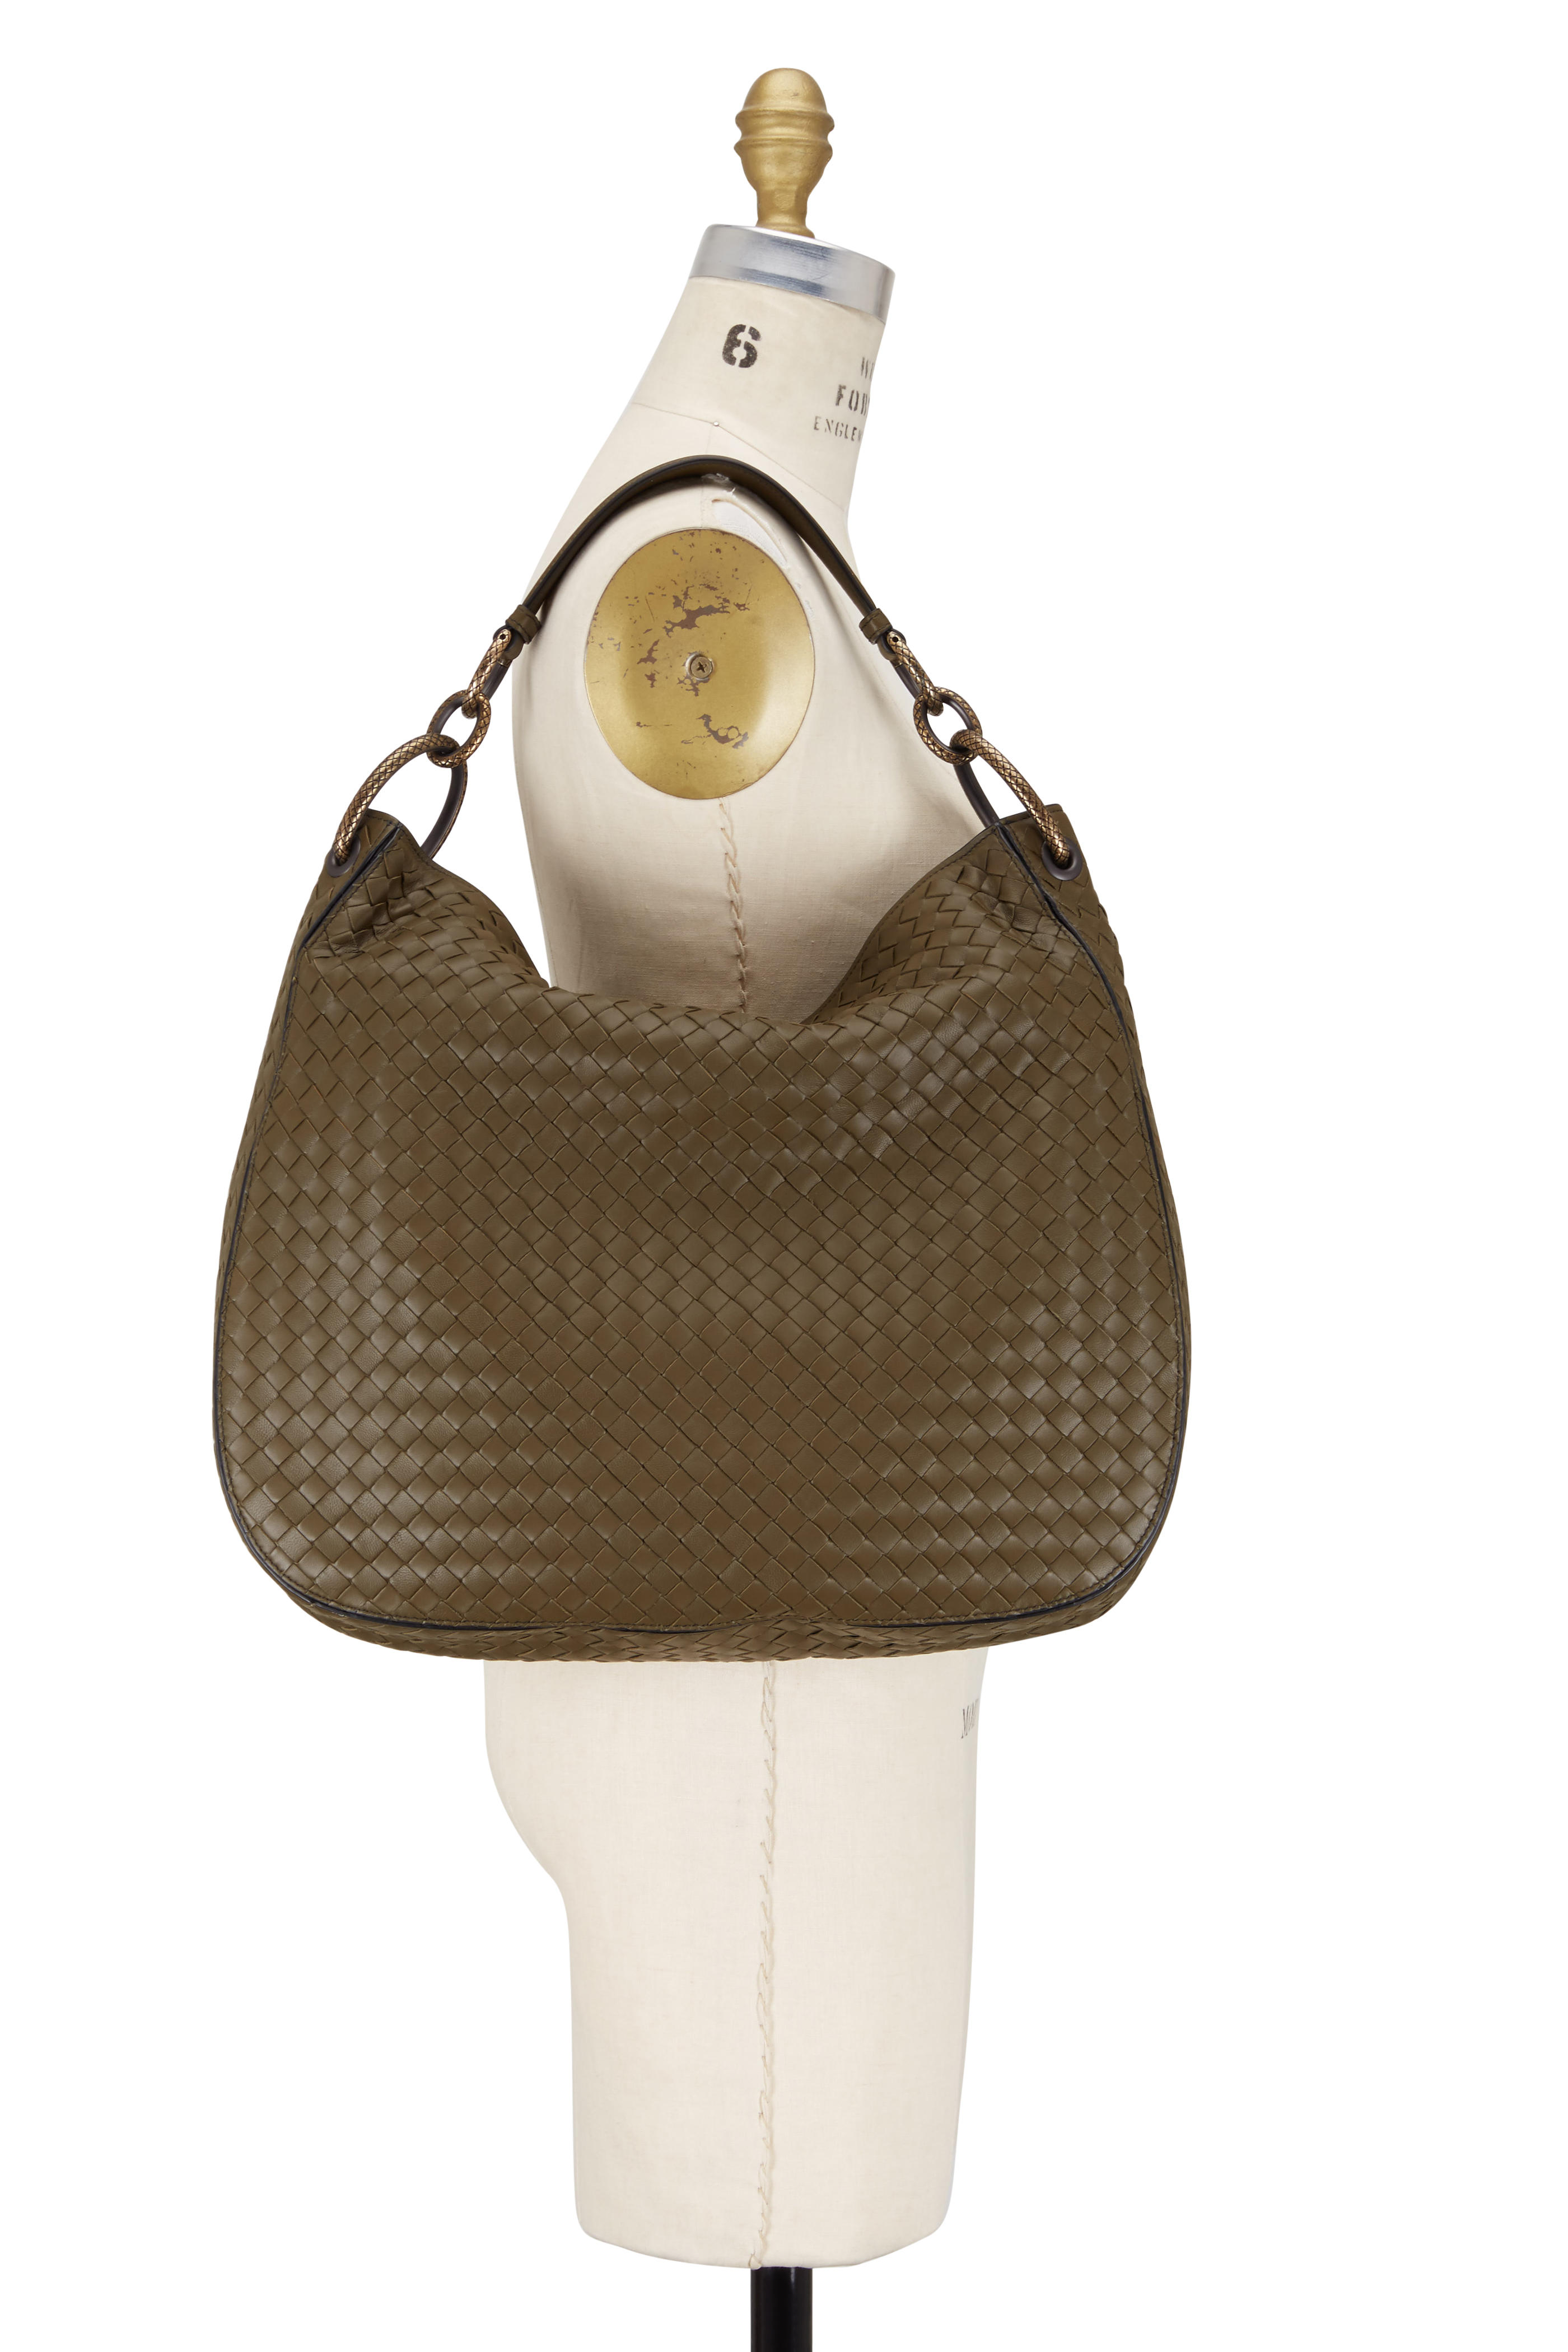 0a1e13e4a5 Bottega Veneta - Olive Green Small Loop Intrecciato Woven Hobo Bag ...